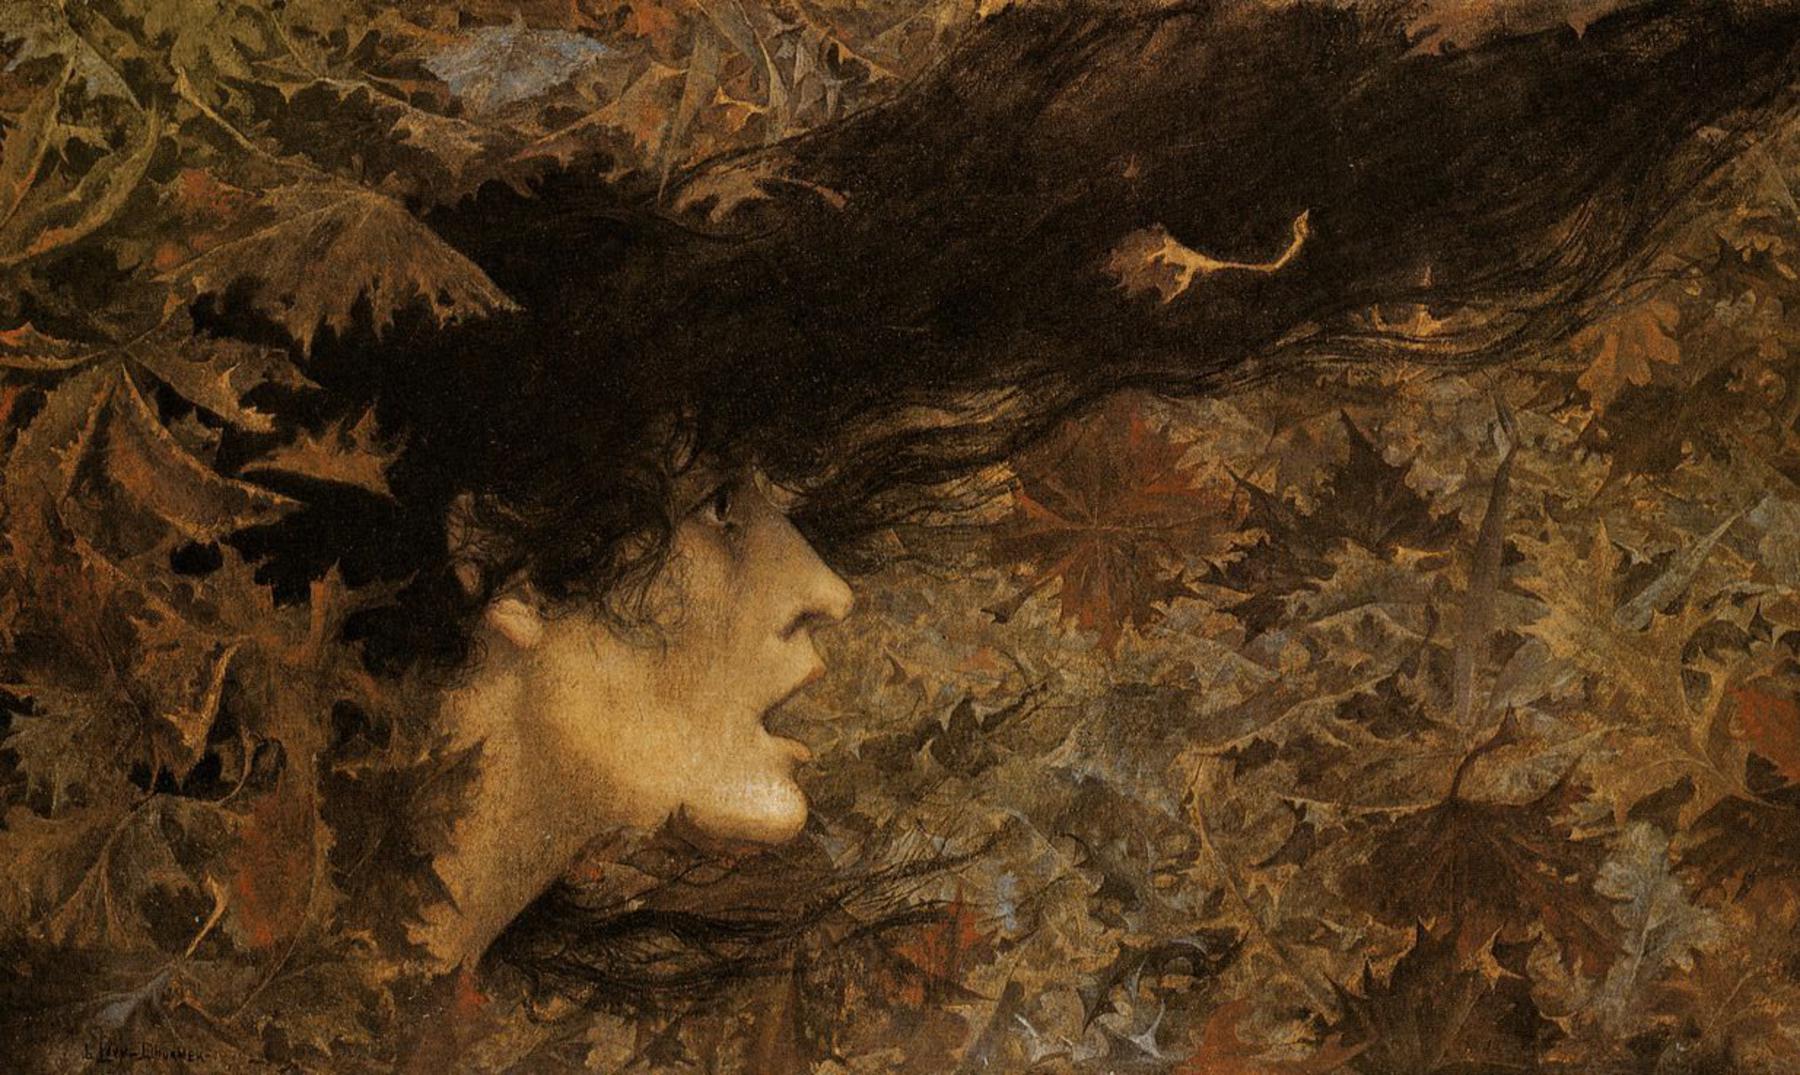 Artistas misteriosos: Lucien Lévy-Dhurmer